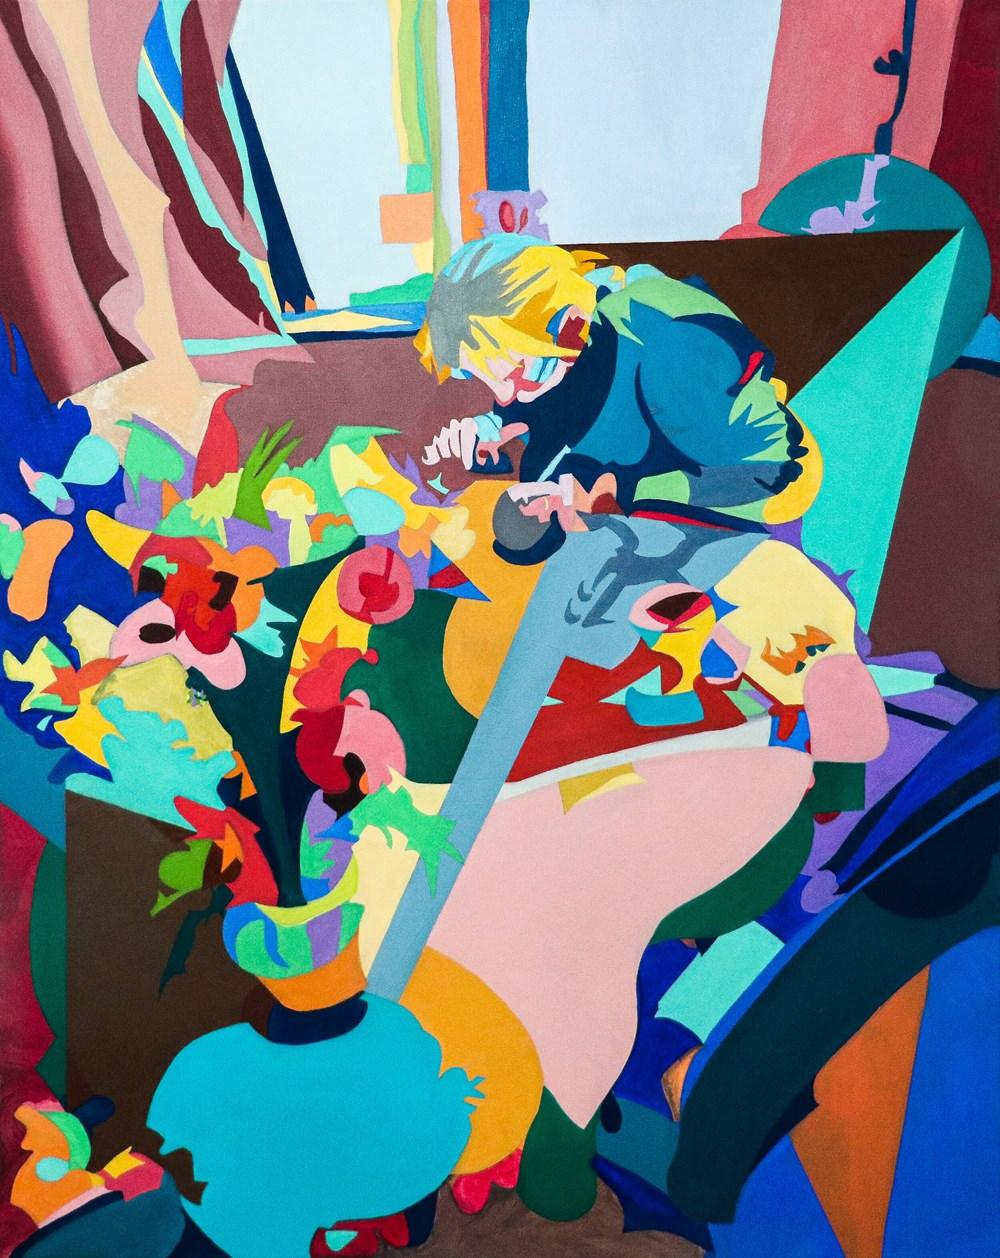 Studio Sale   Lee Kay-Barry - Lot 10, Lee Kay-Barry, Step Into La Petit Galerie